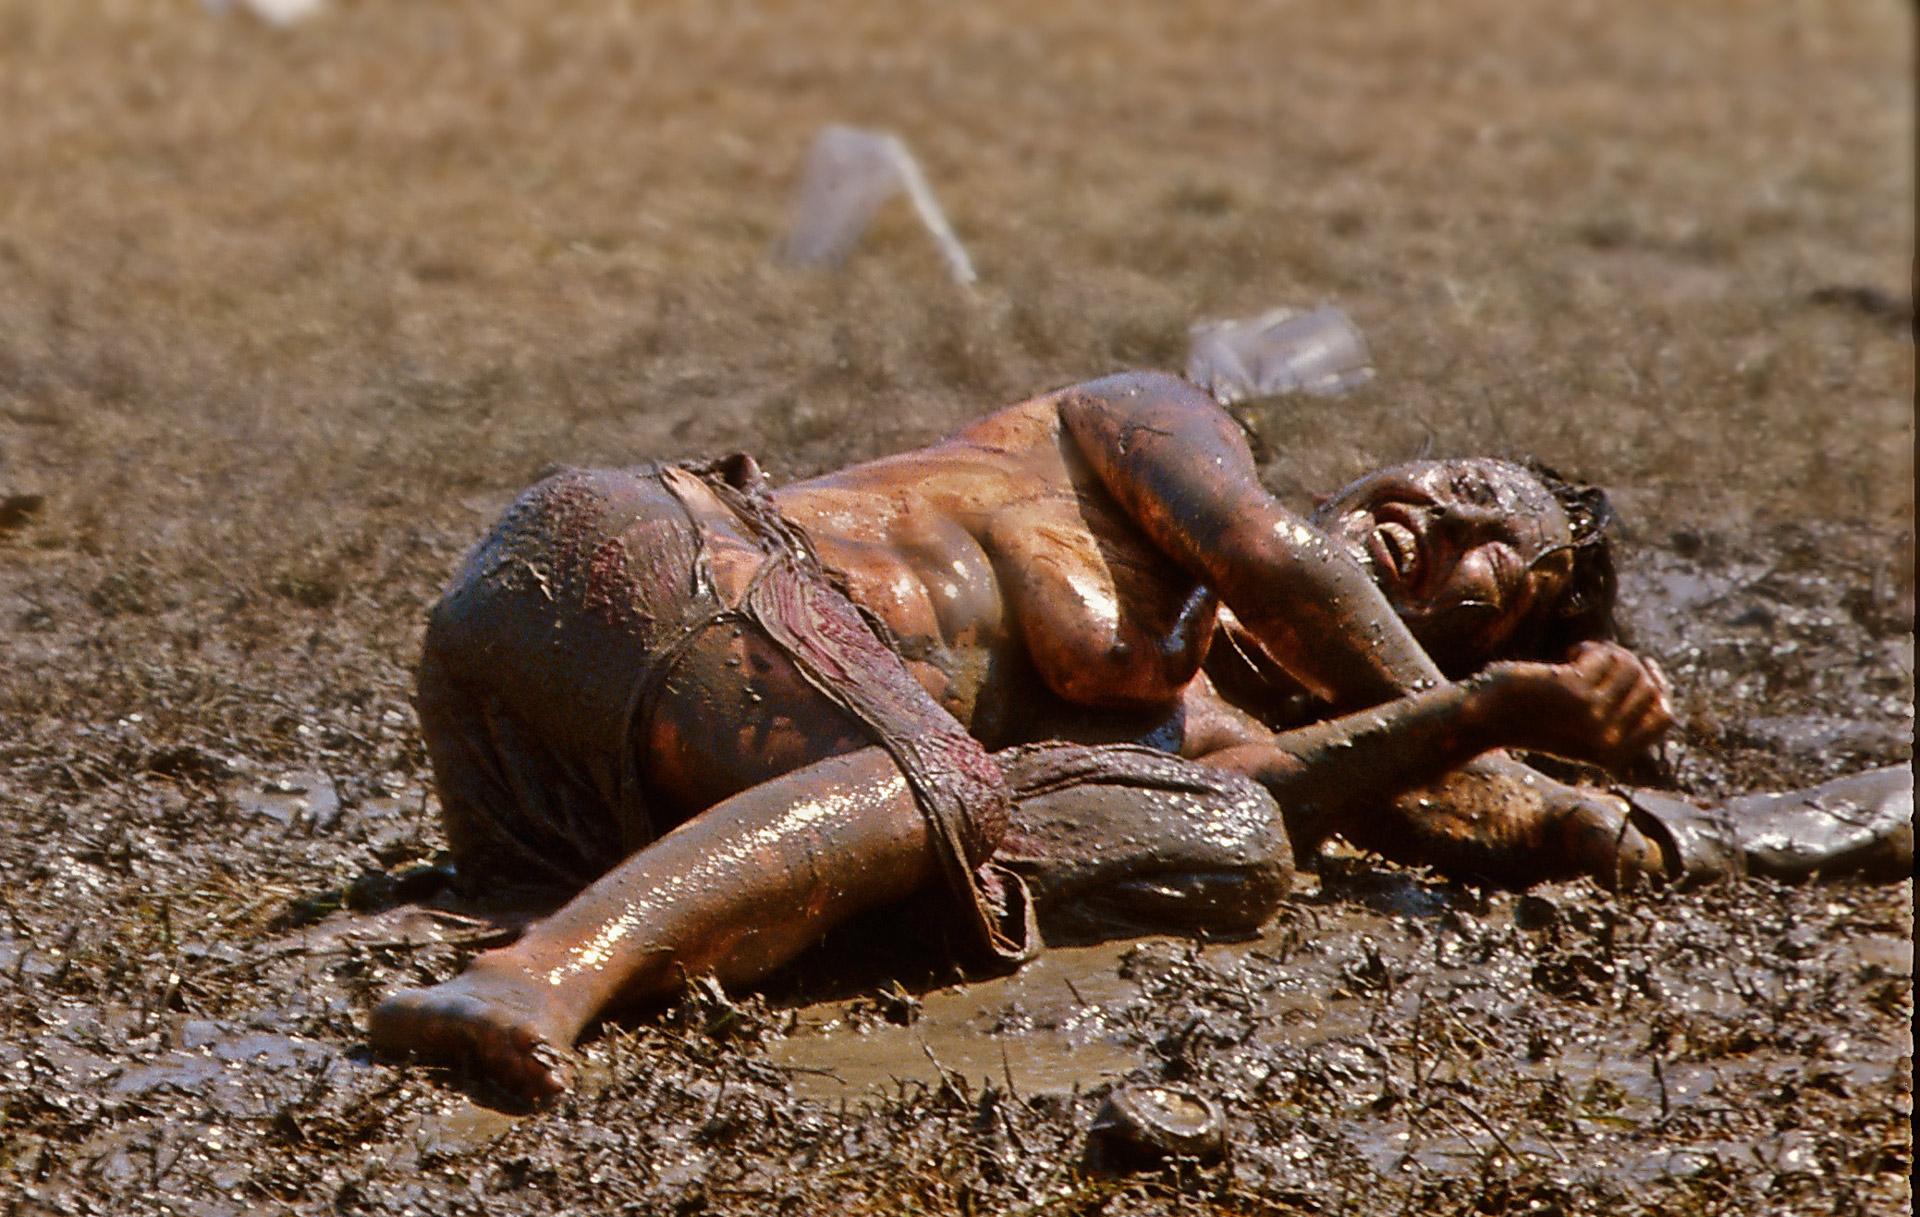 Girl in the mud, Glastonbury Festival